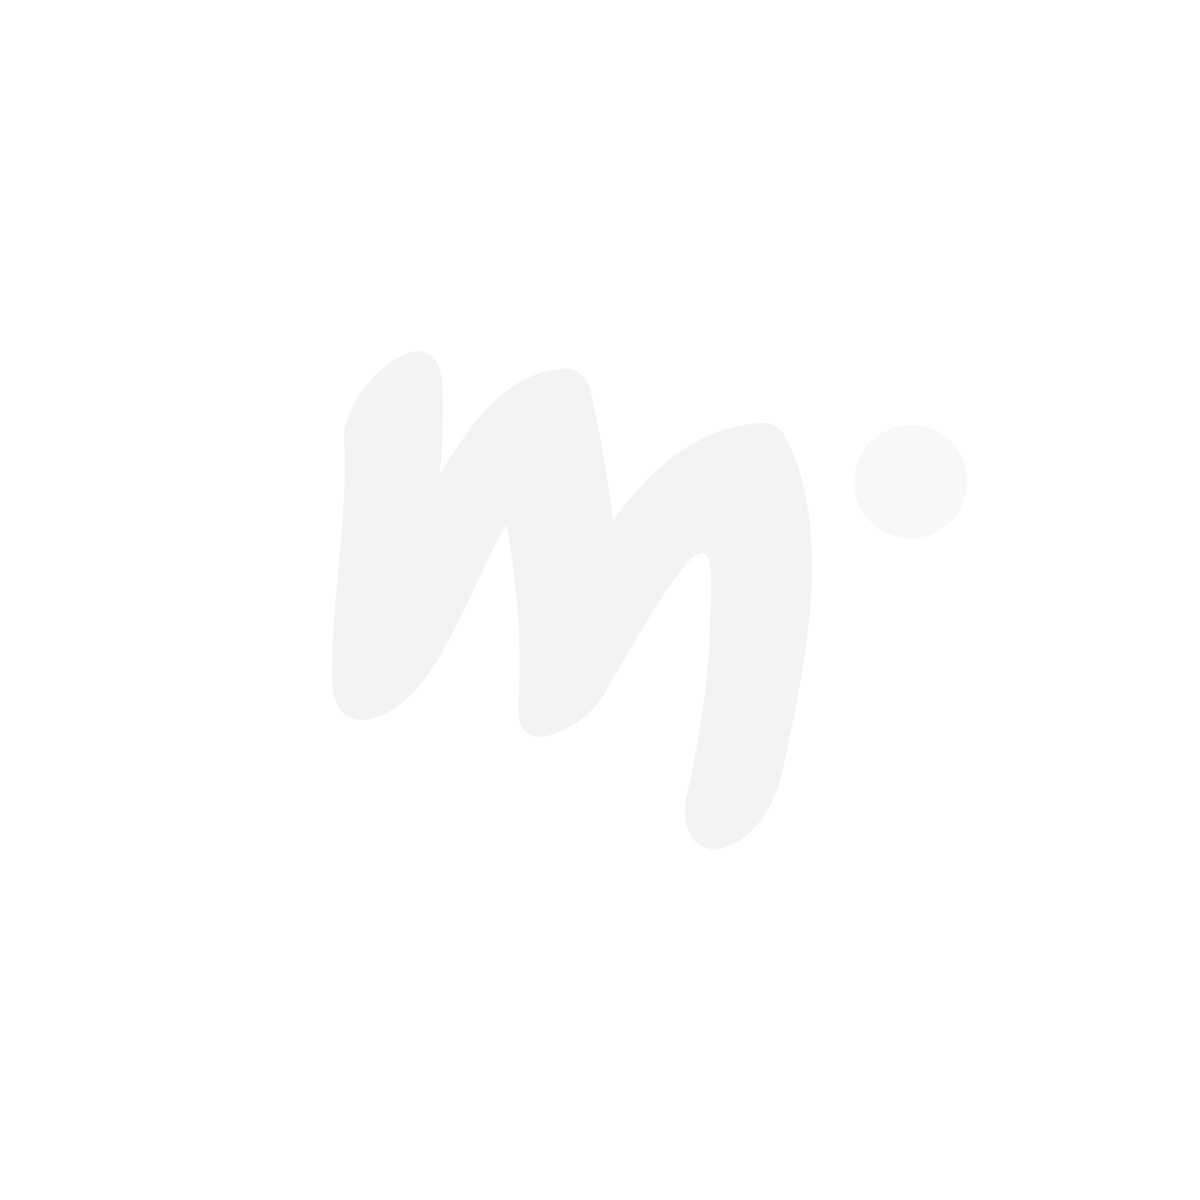 Martinex Neliö-pajukorit 3 kpl